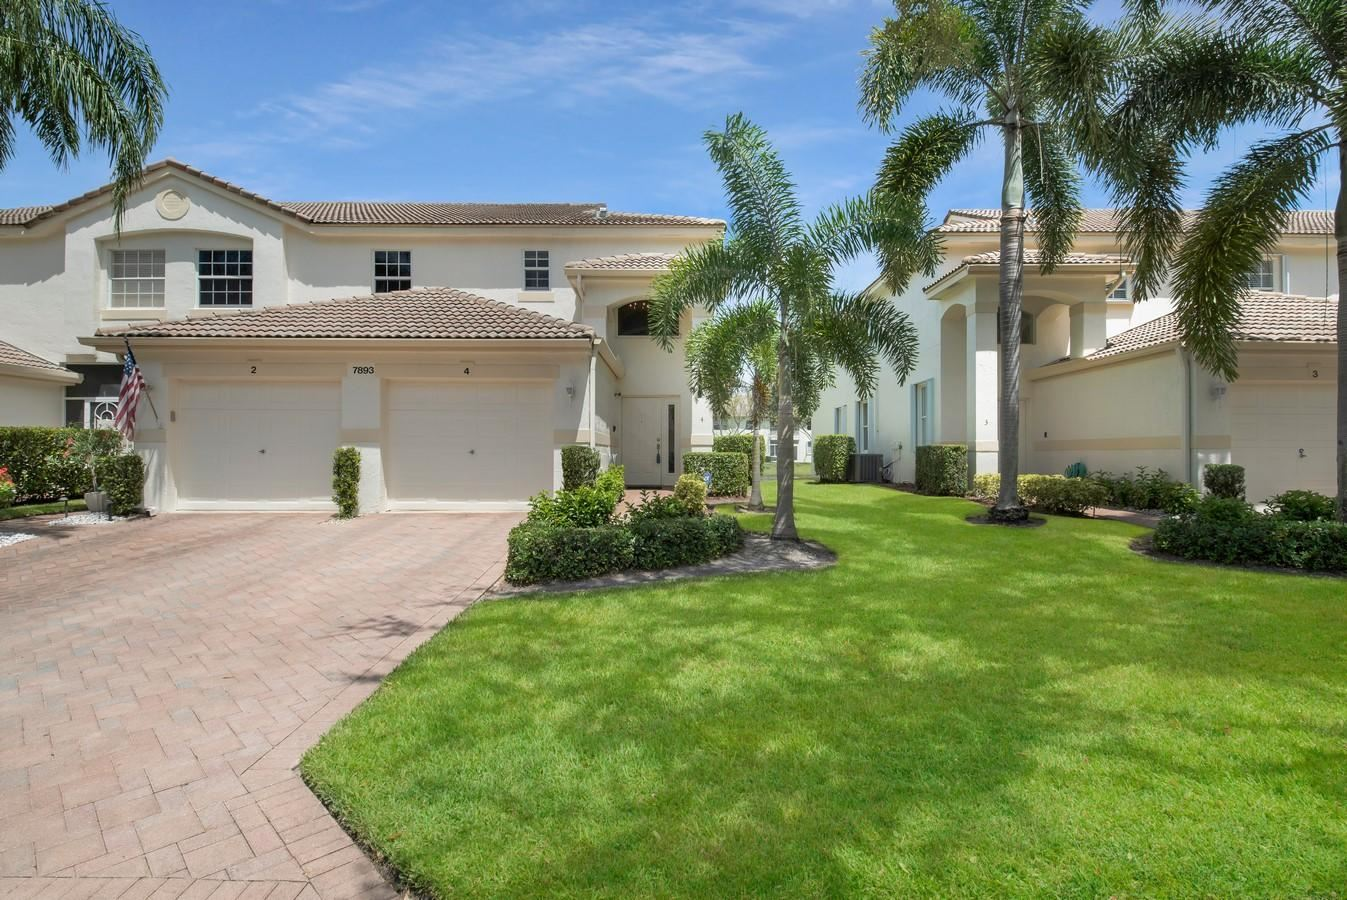 7893 Laina Lane #4, Boynton Beach, FL 33437 - #: RX-10651116